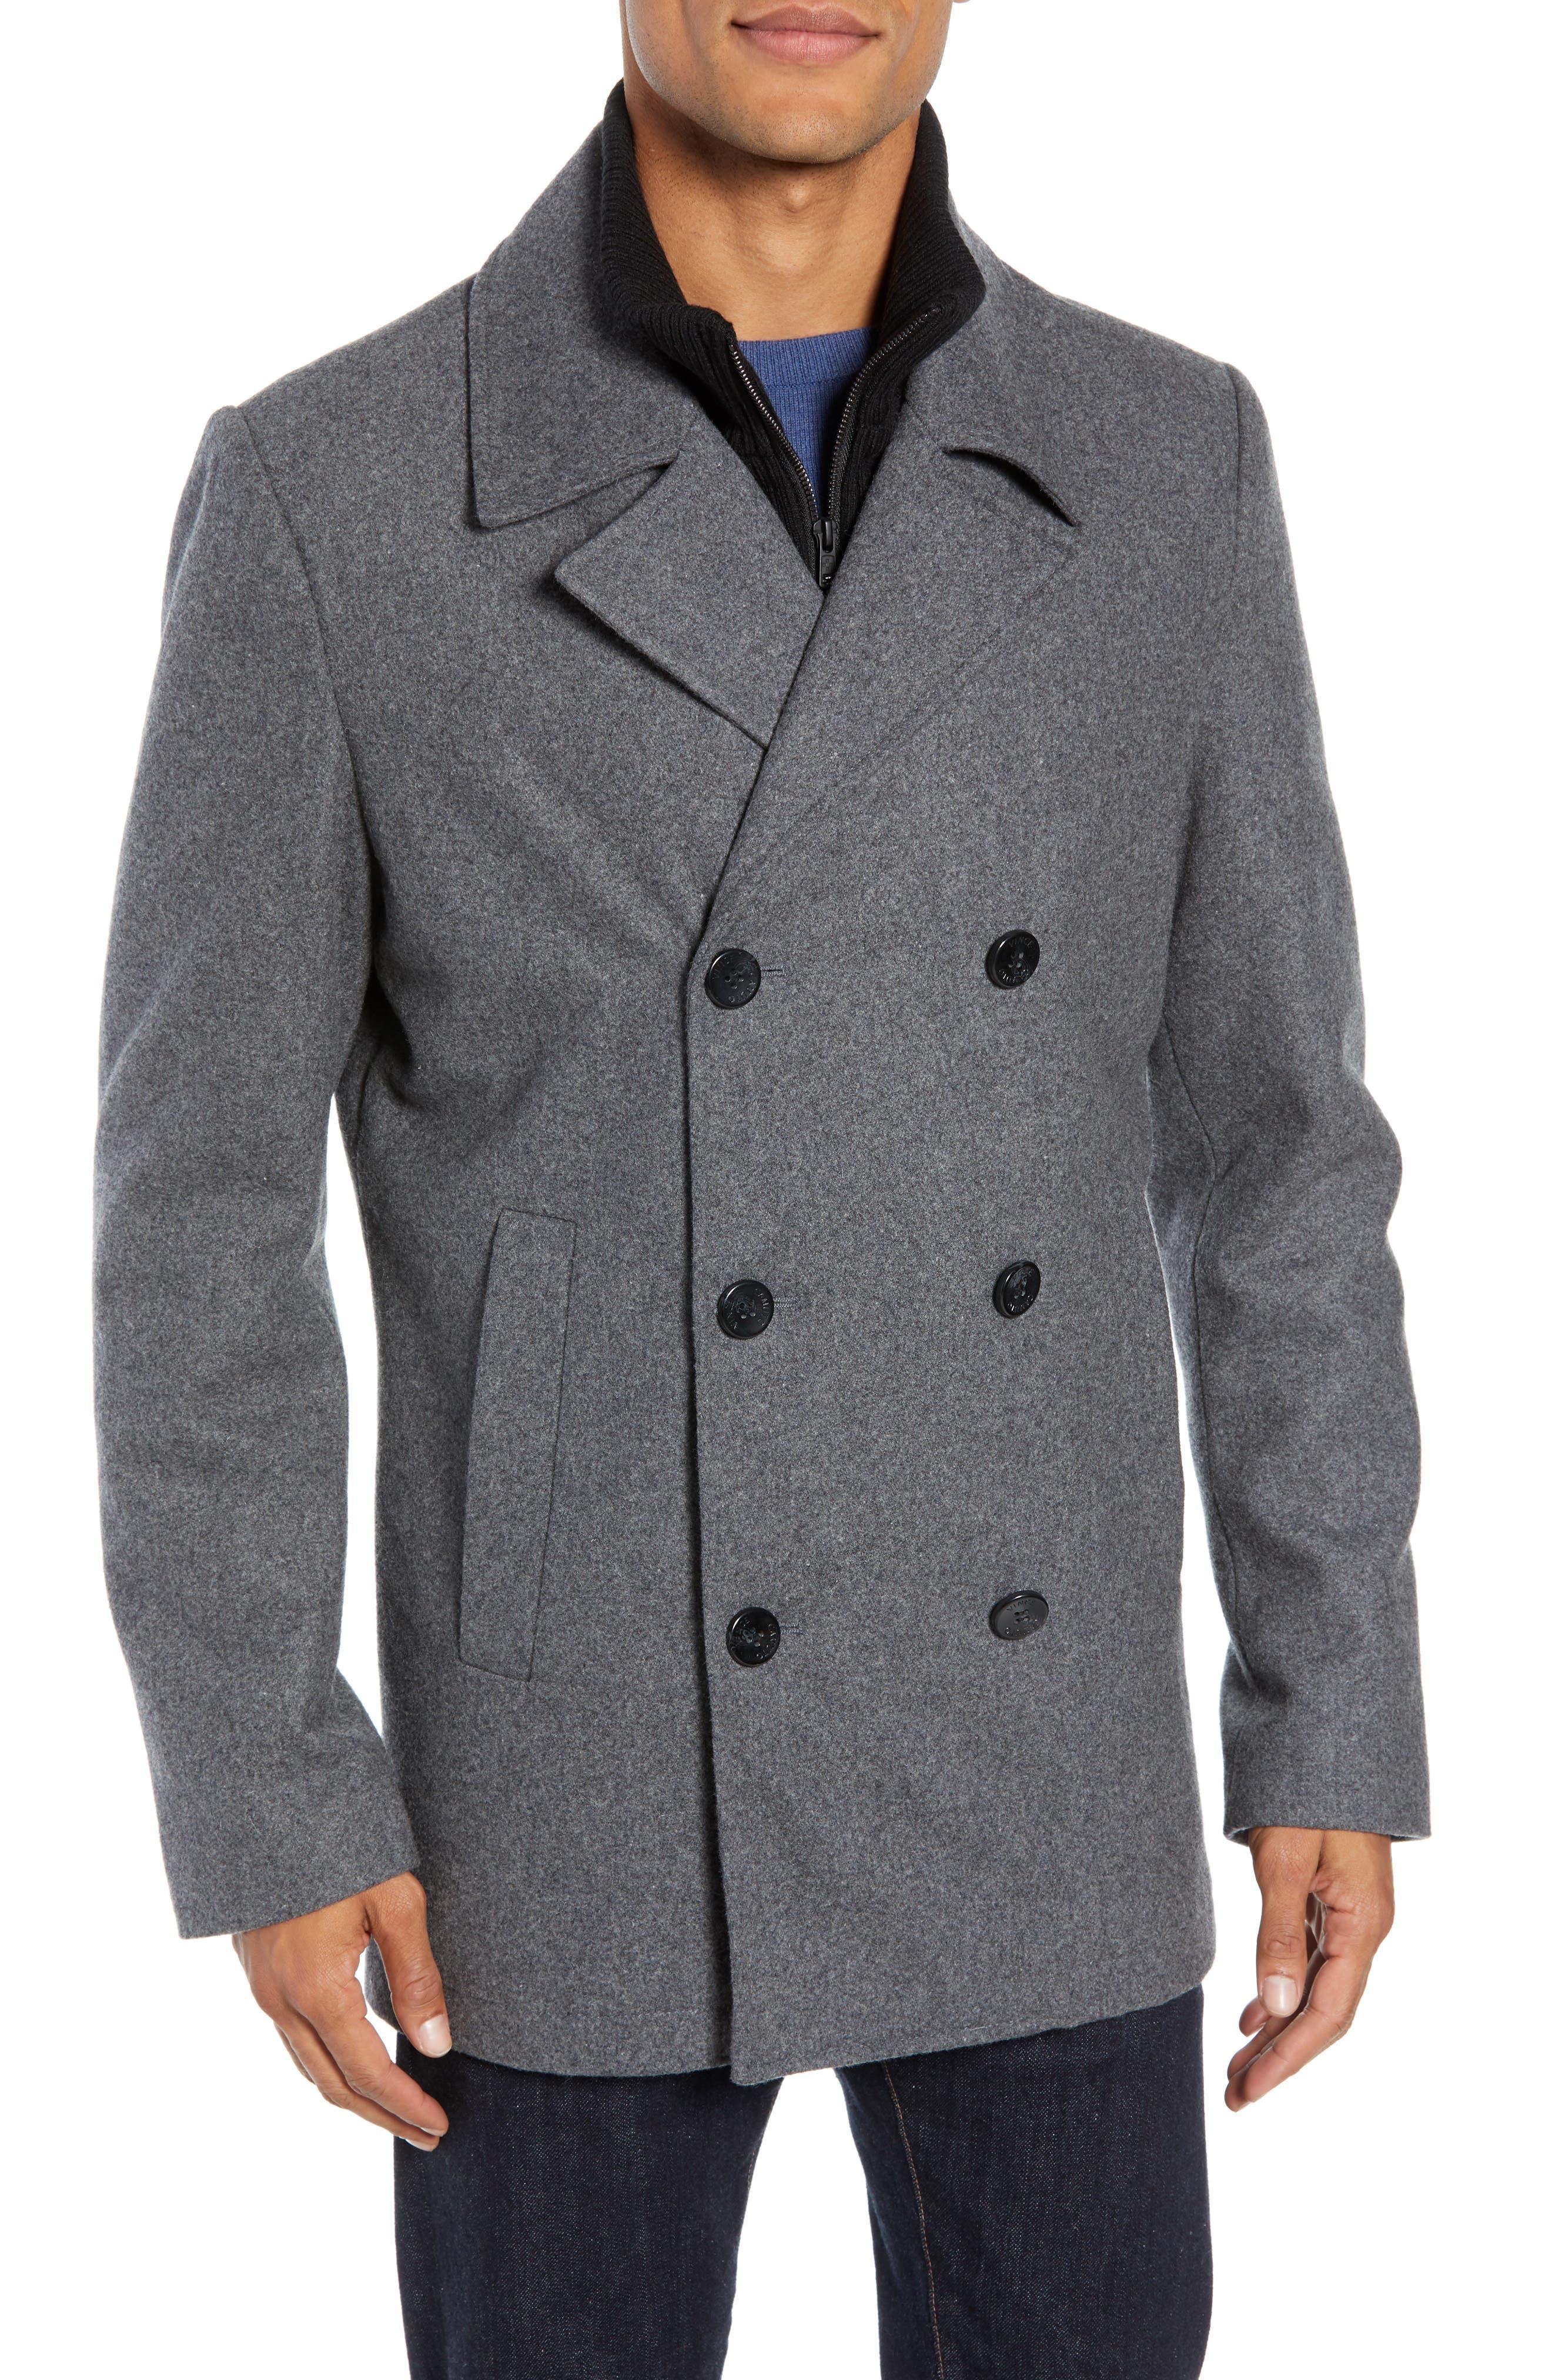 479128eb1ed Vince camuto dock peacoat main color heather grey jpg 780x1196 Grey pea coat